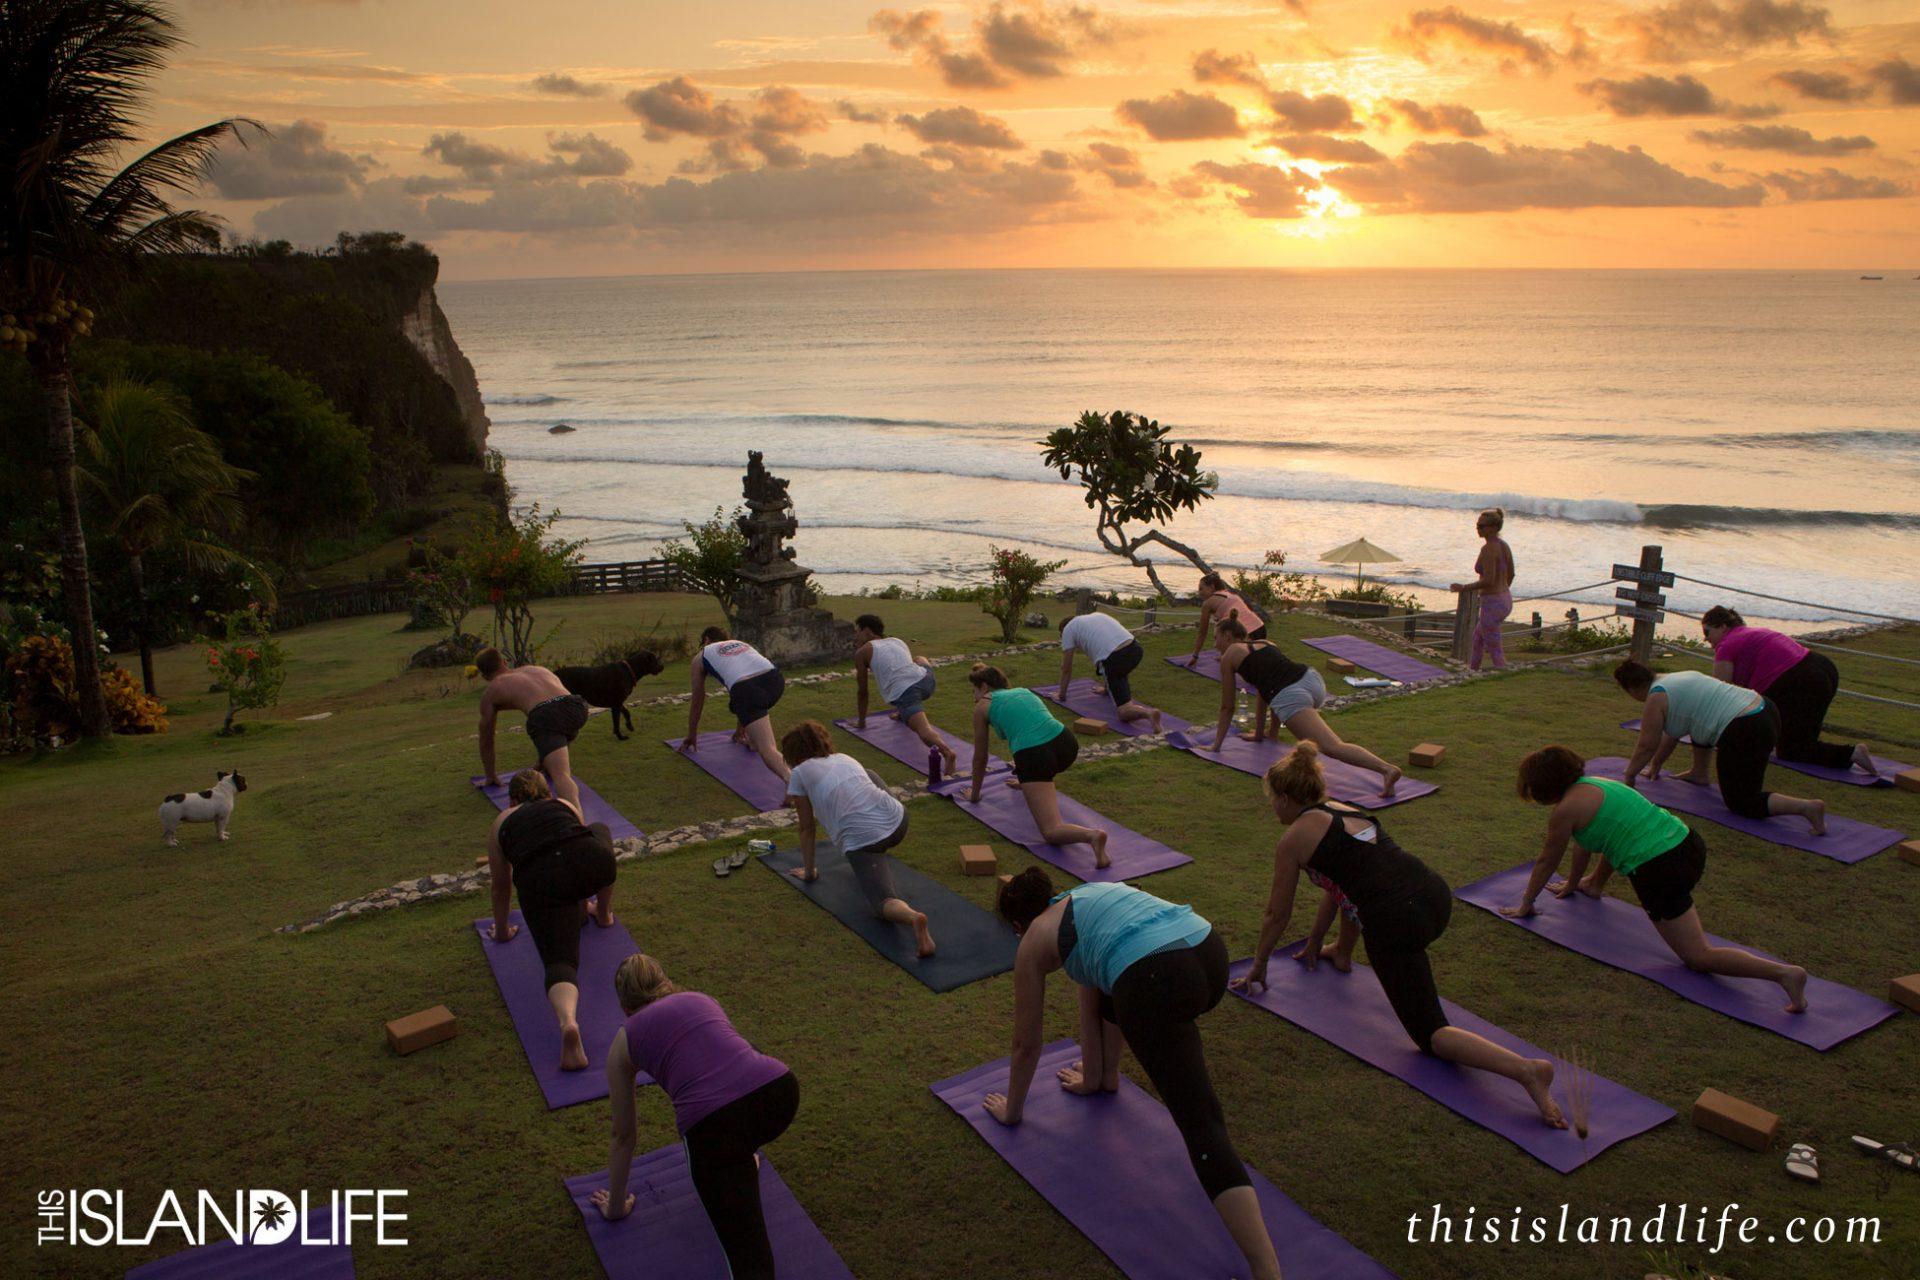 Bali Bliss Retreats | THIS ISLAND LIFE